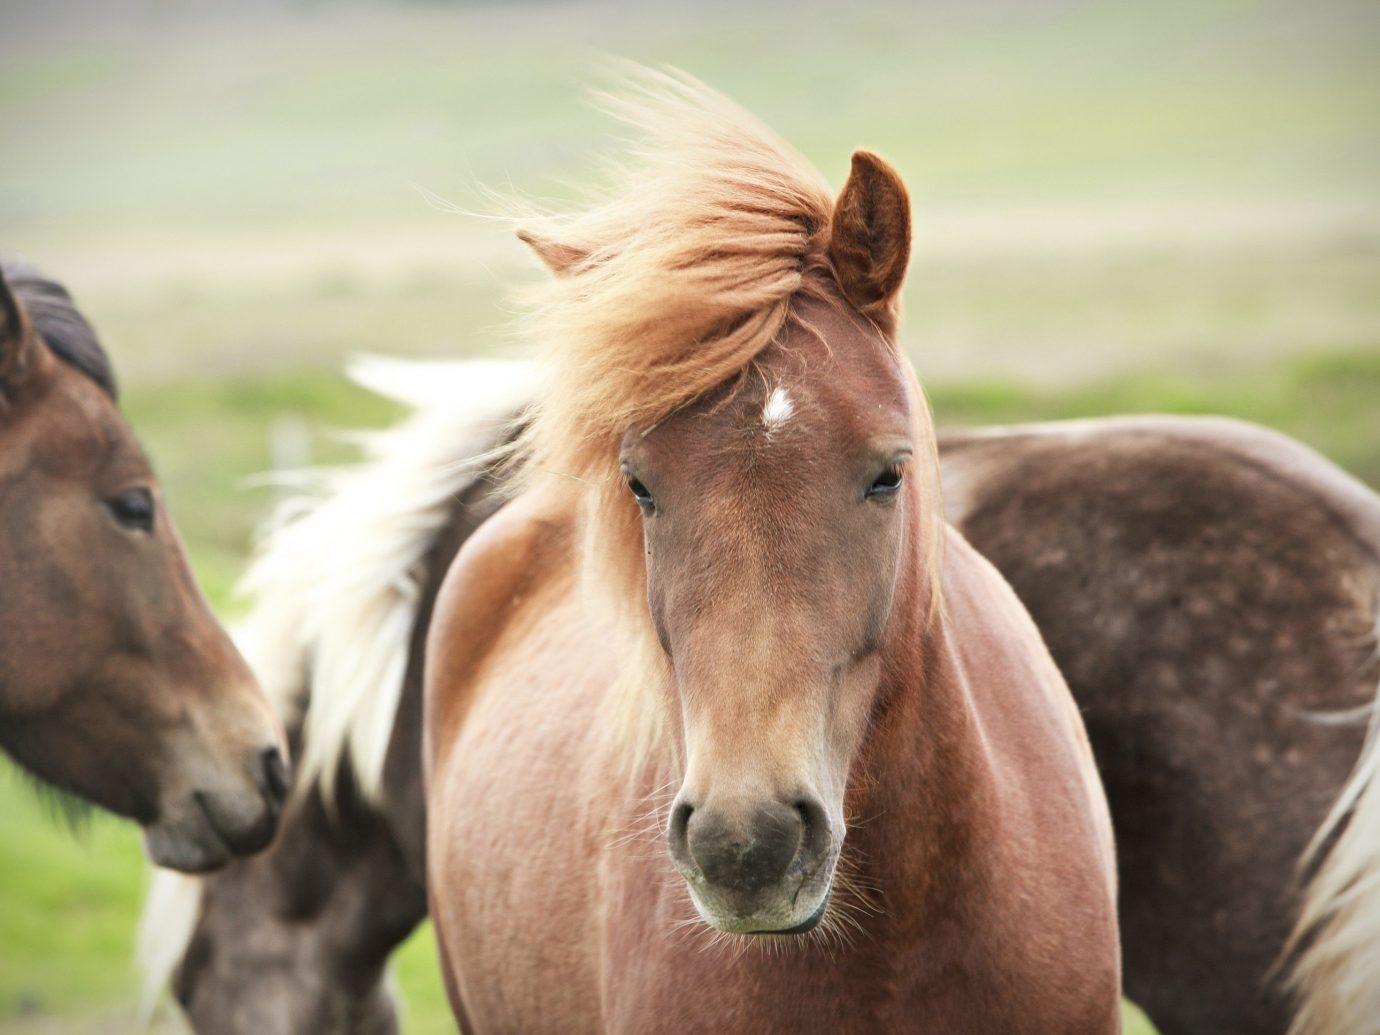 Trip Ideas grass horse outdoor animal mammal field vertebrate mare mane fauna pasture mustang horse horse like mammal stallion standing foal colt grassy close